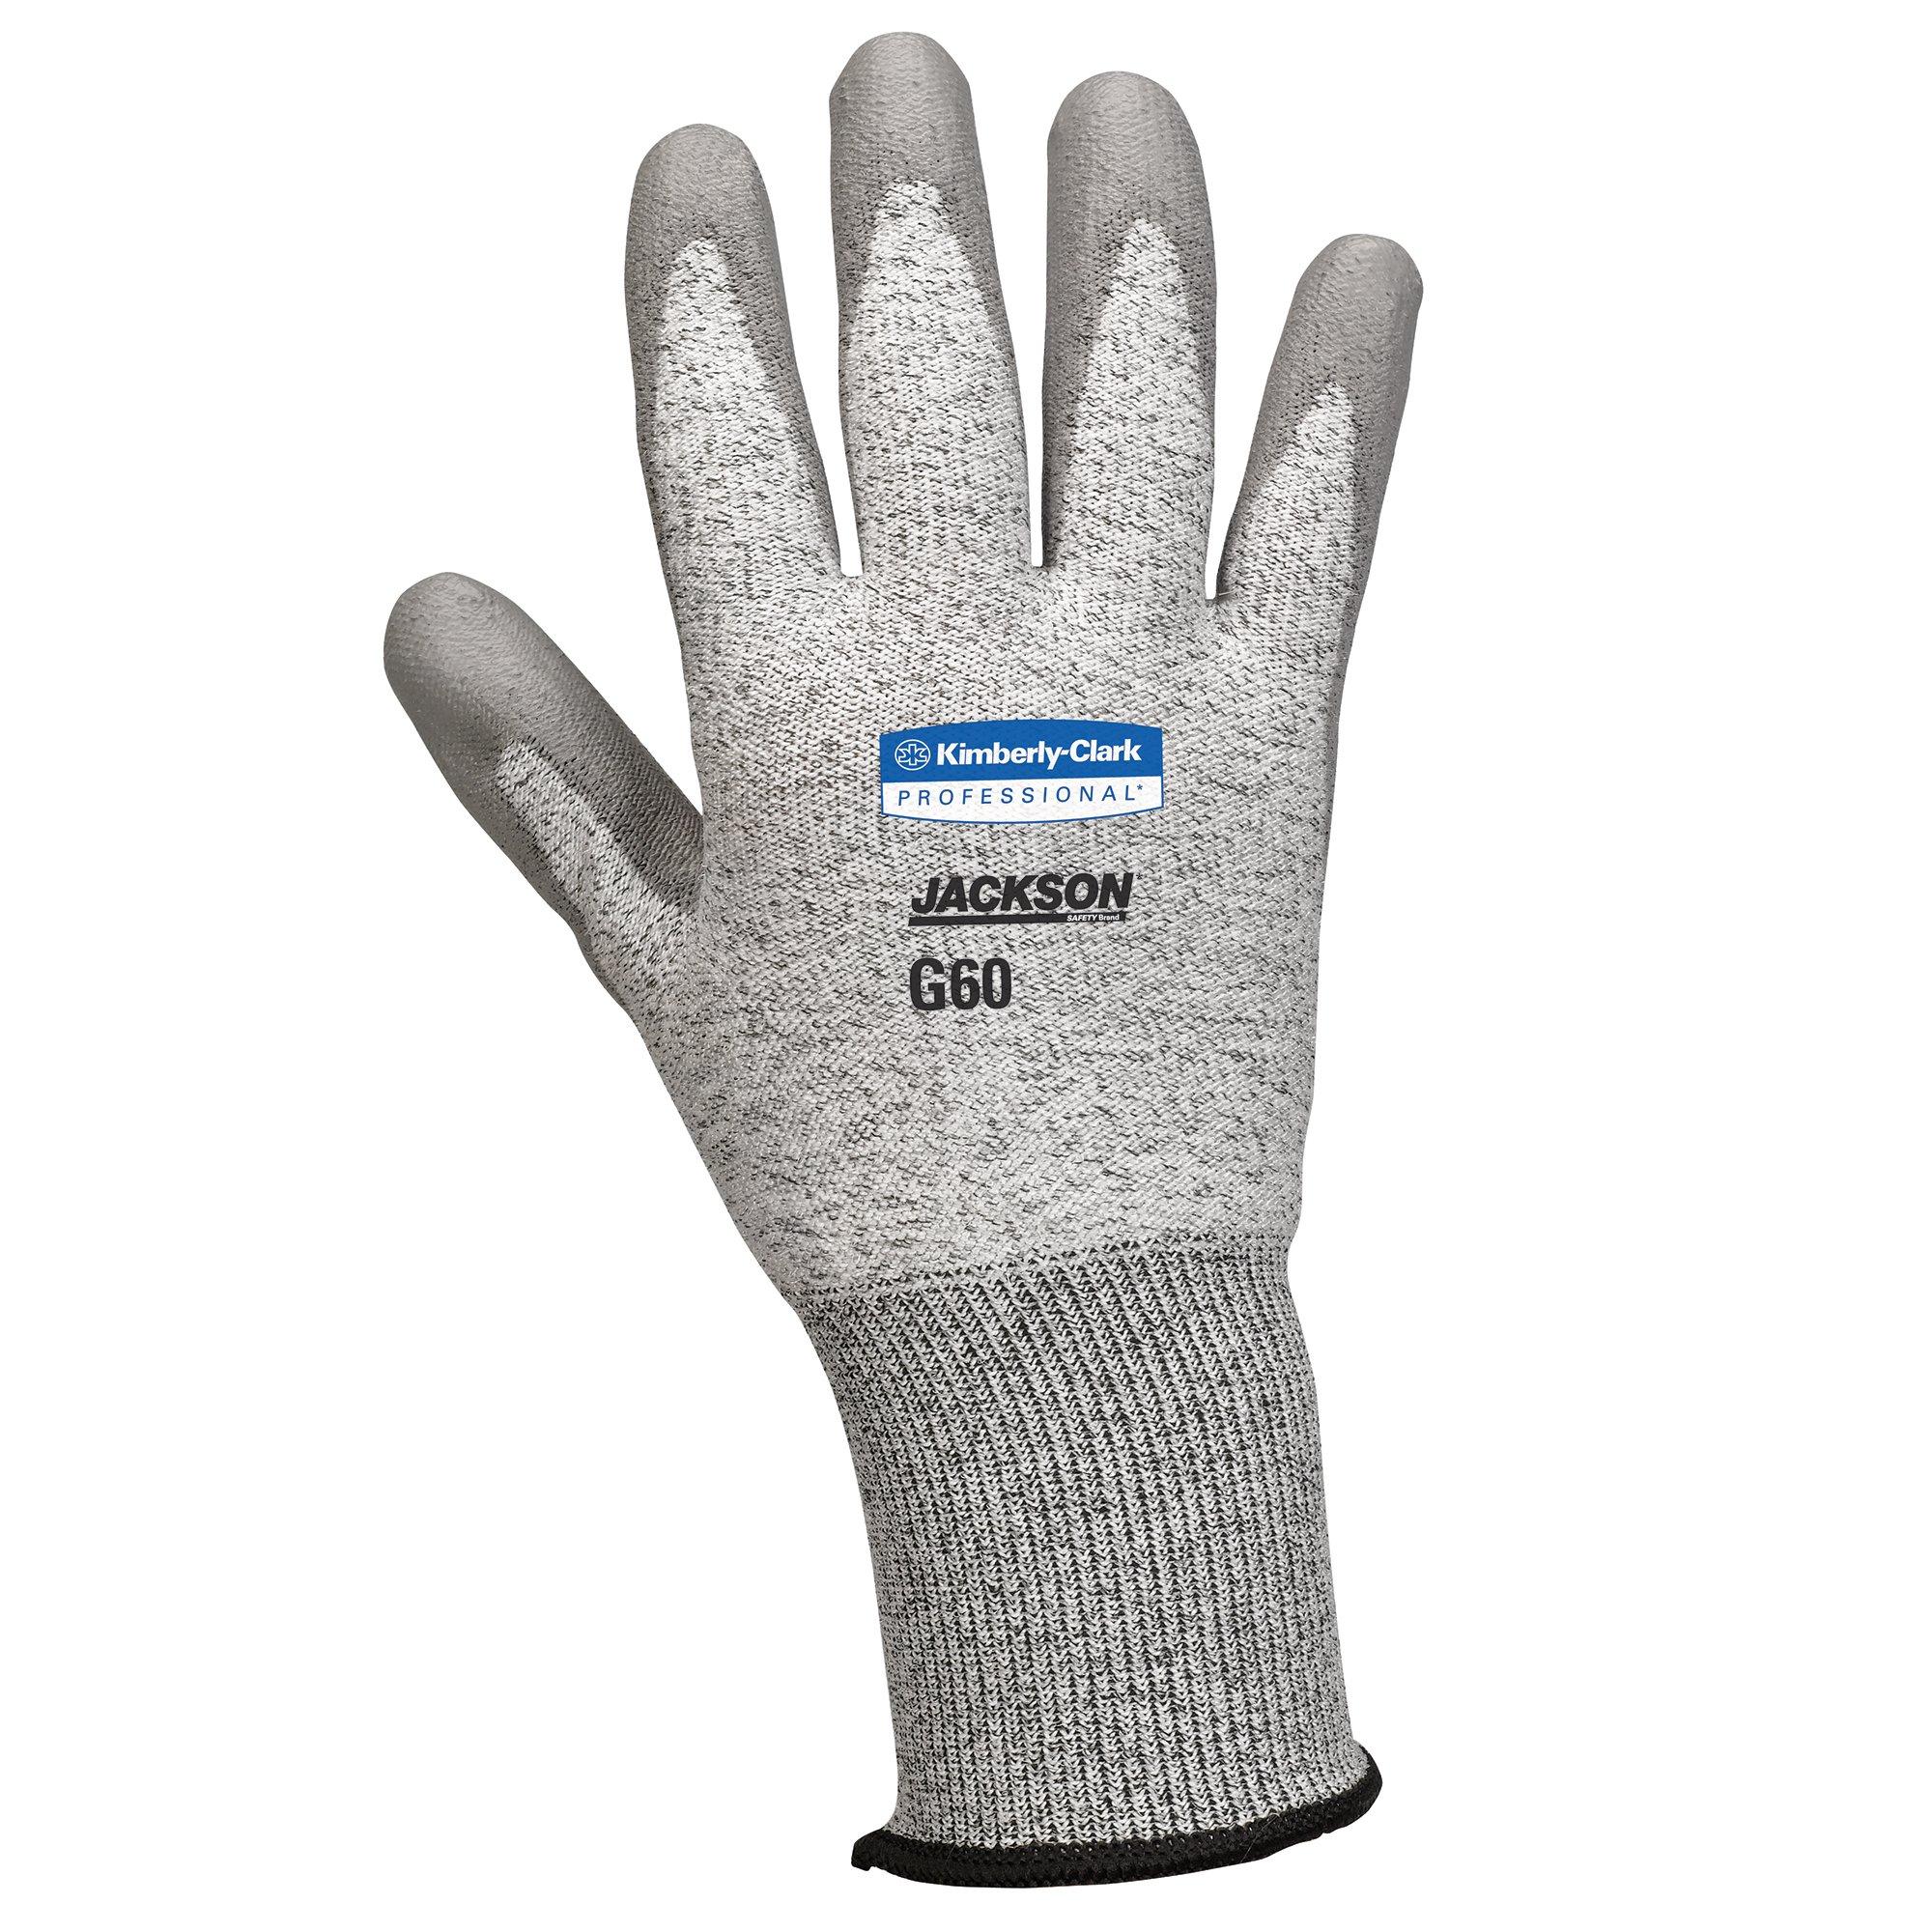 Jackson Safety G60 Level 3 Economy Cut Resistant Gloves (13825), Grey & Salt & Pepper, Large, 12 Pairs / Bag, 1 Bag